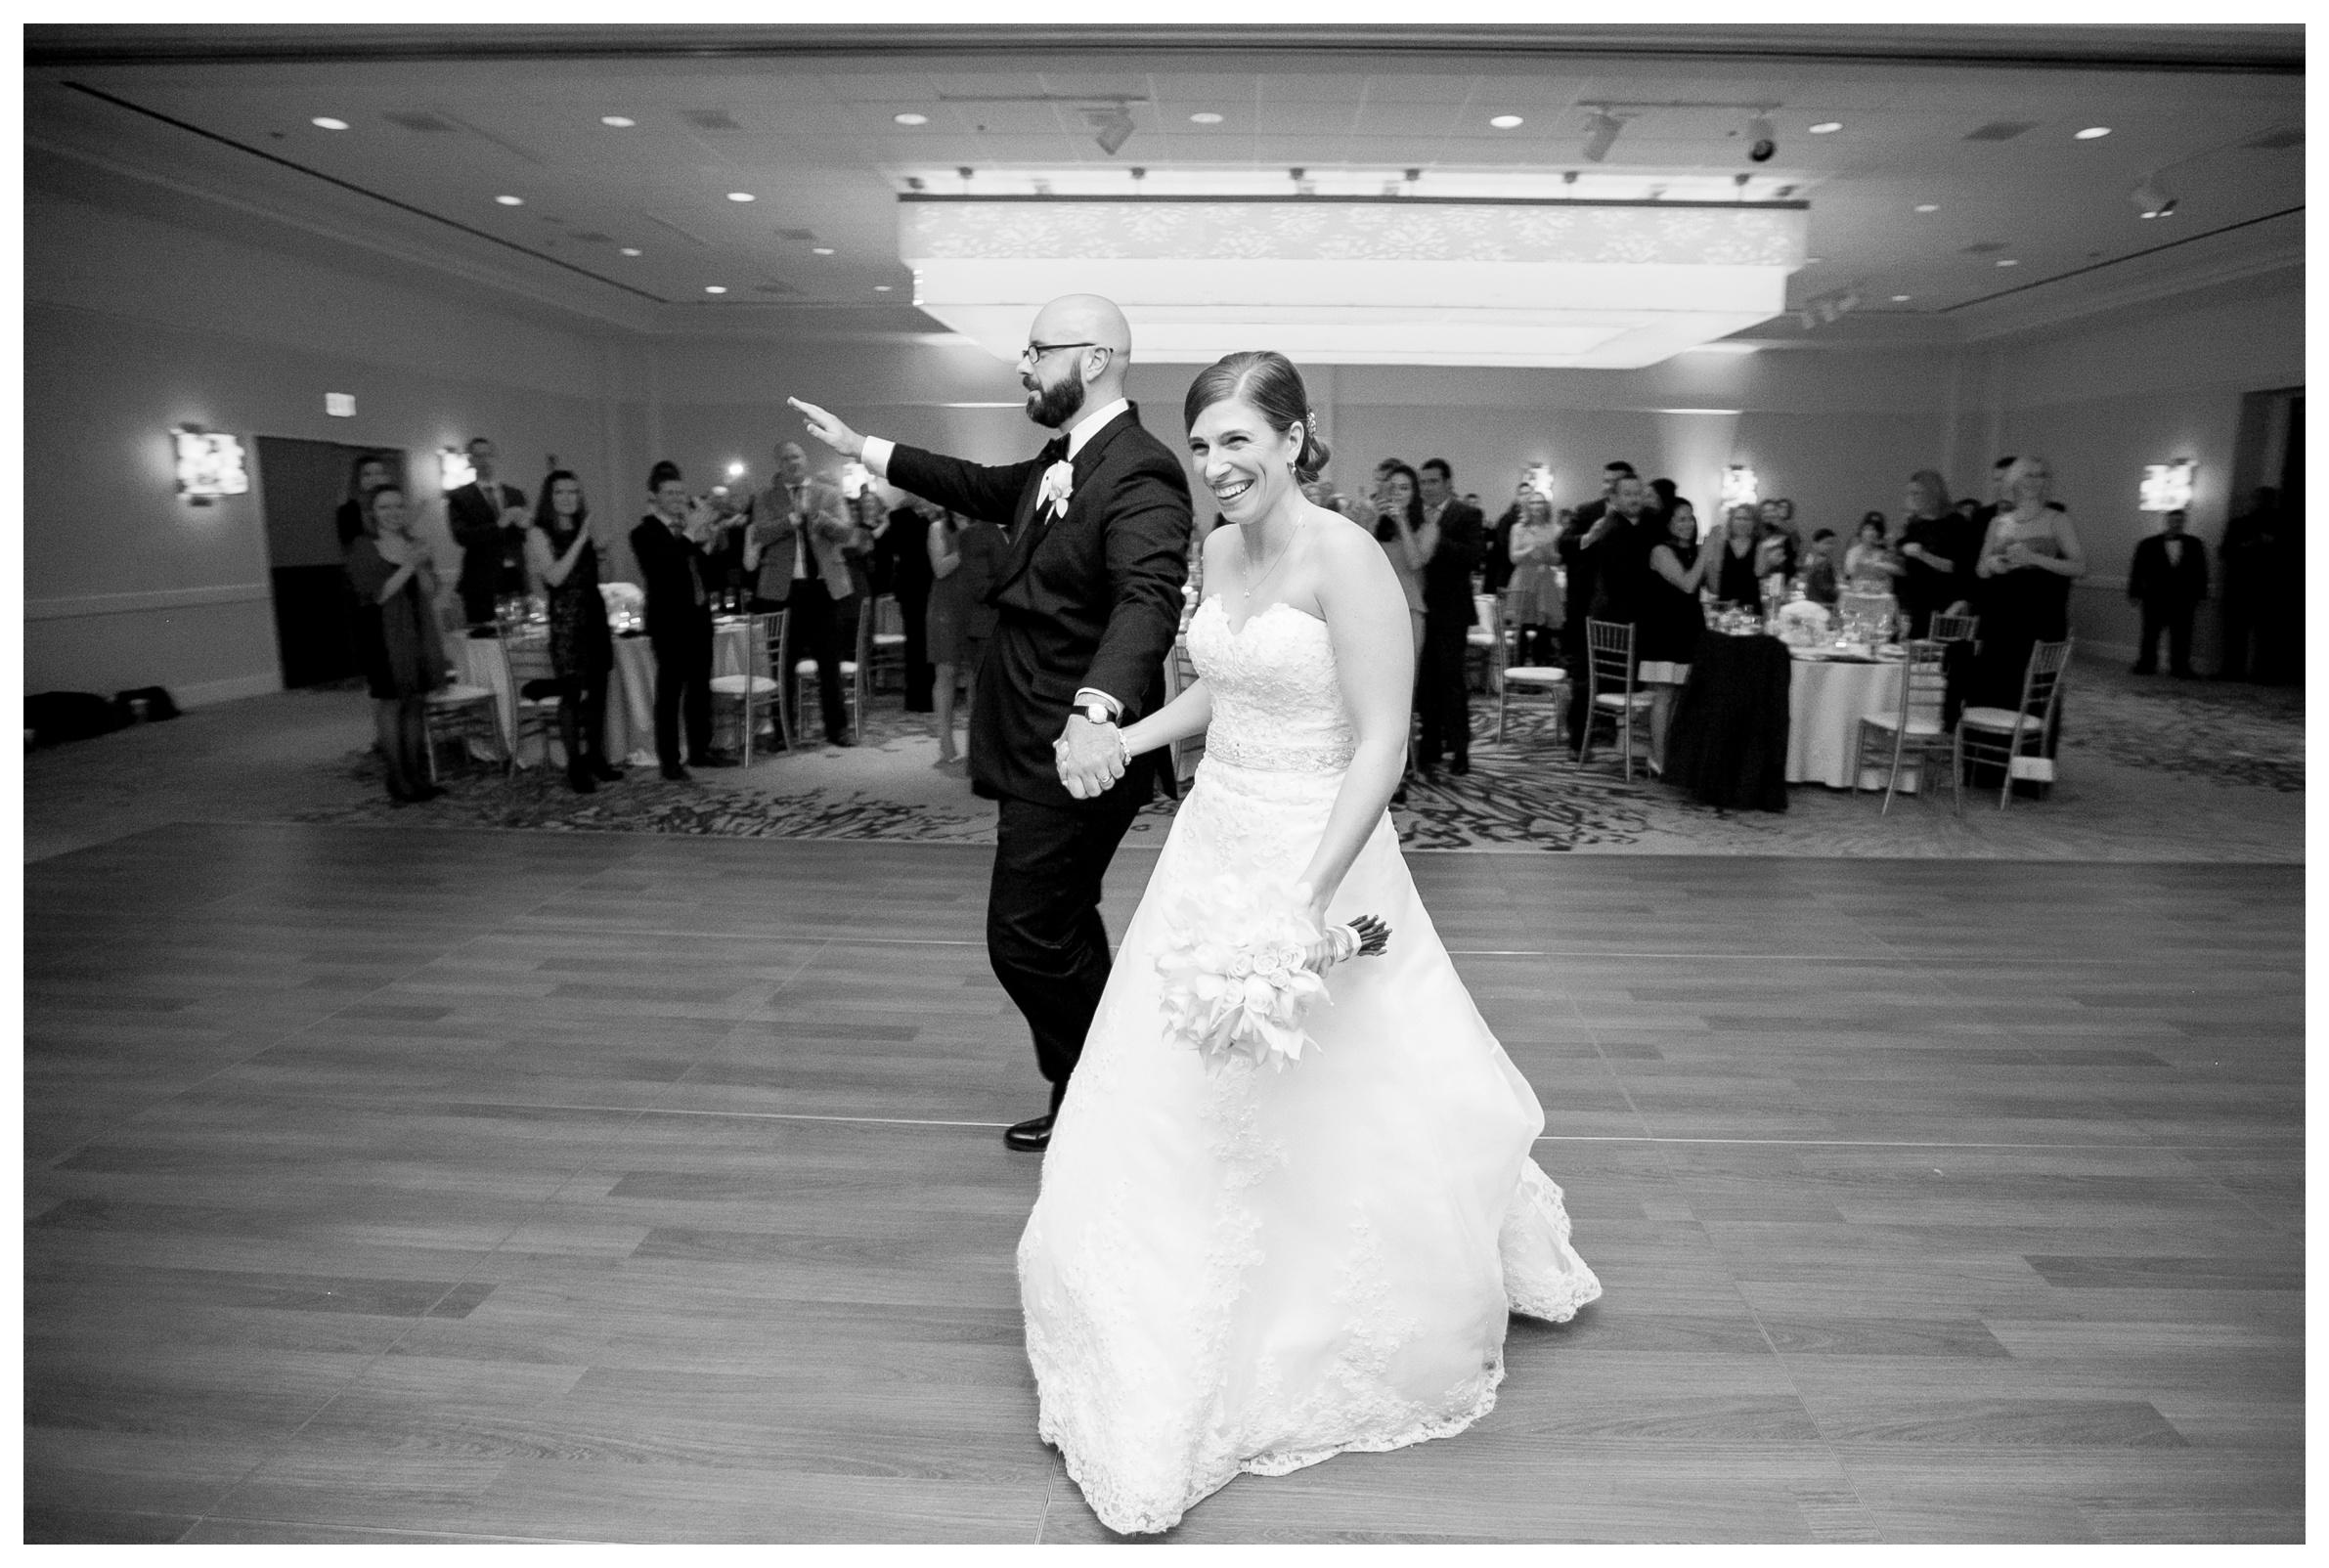 westin-ohare-chicago-wedding_0019.jpg